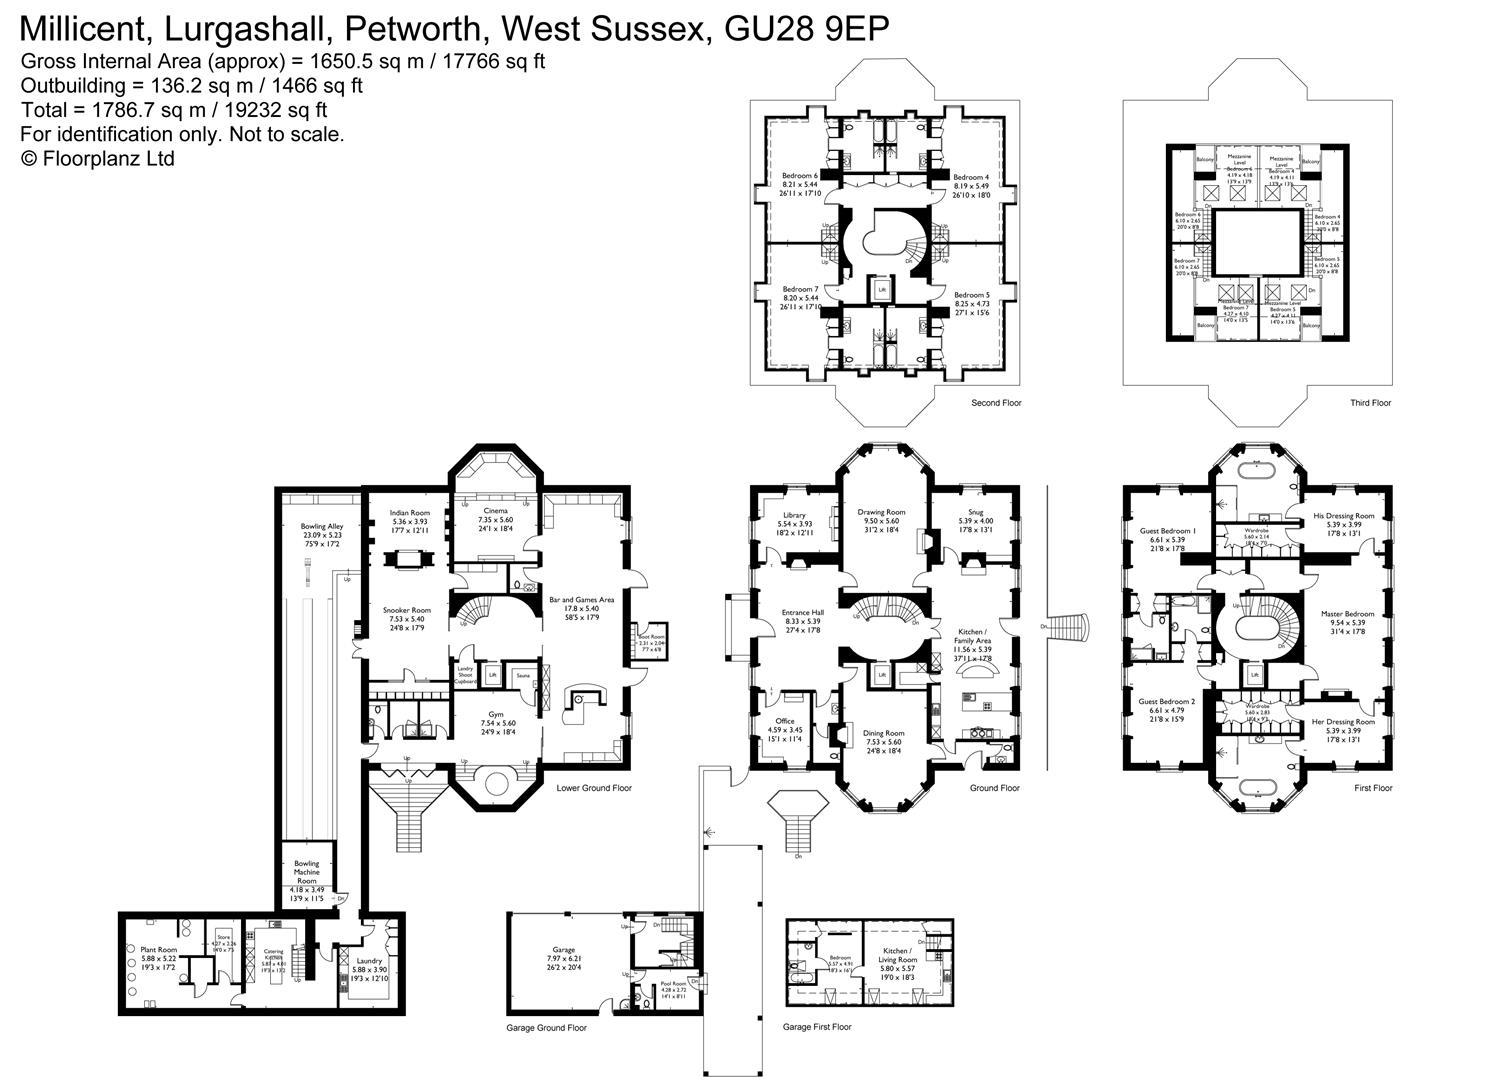 lurgashall petworth gu28 property for sale 40181644